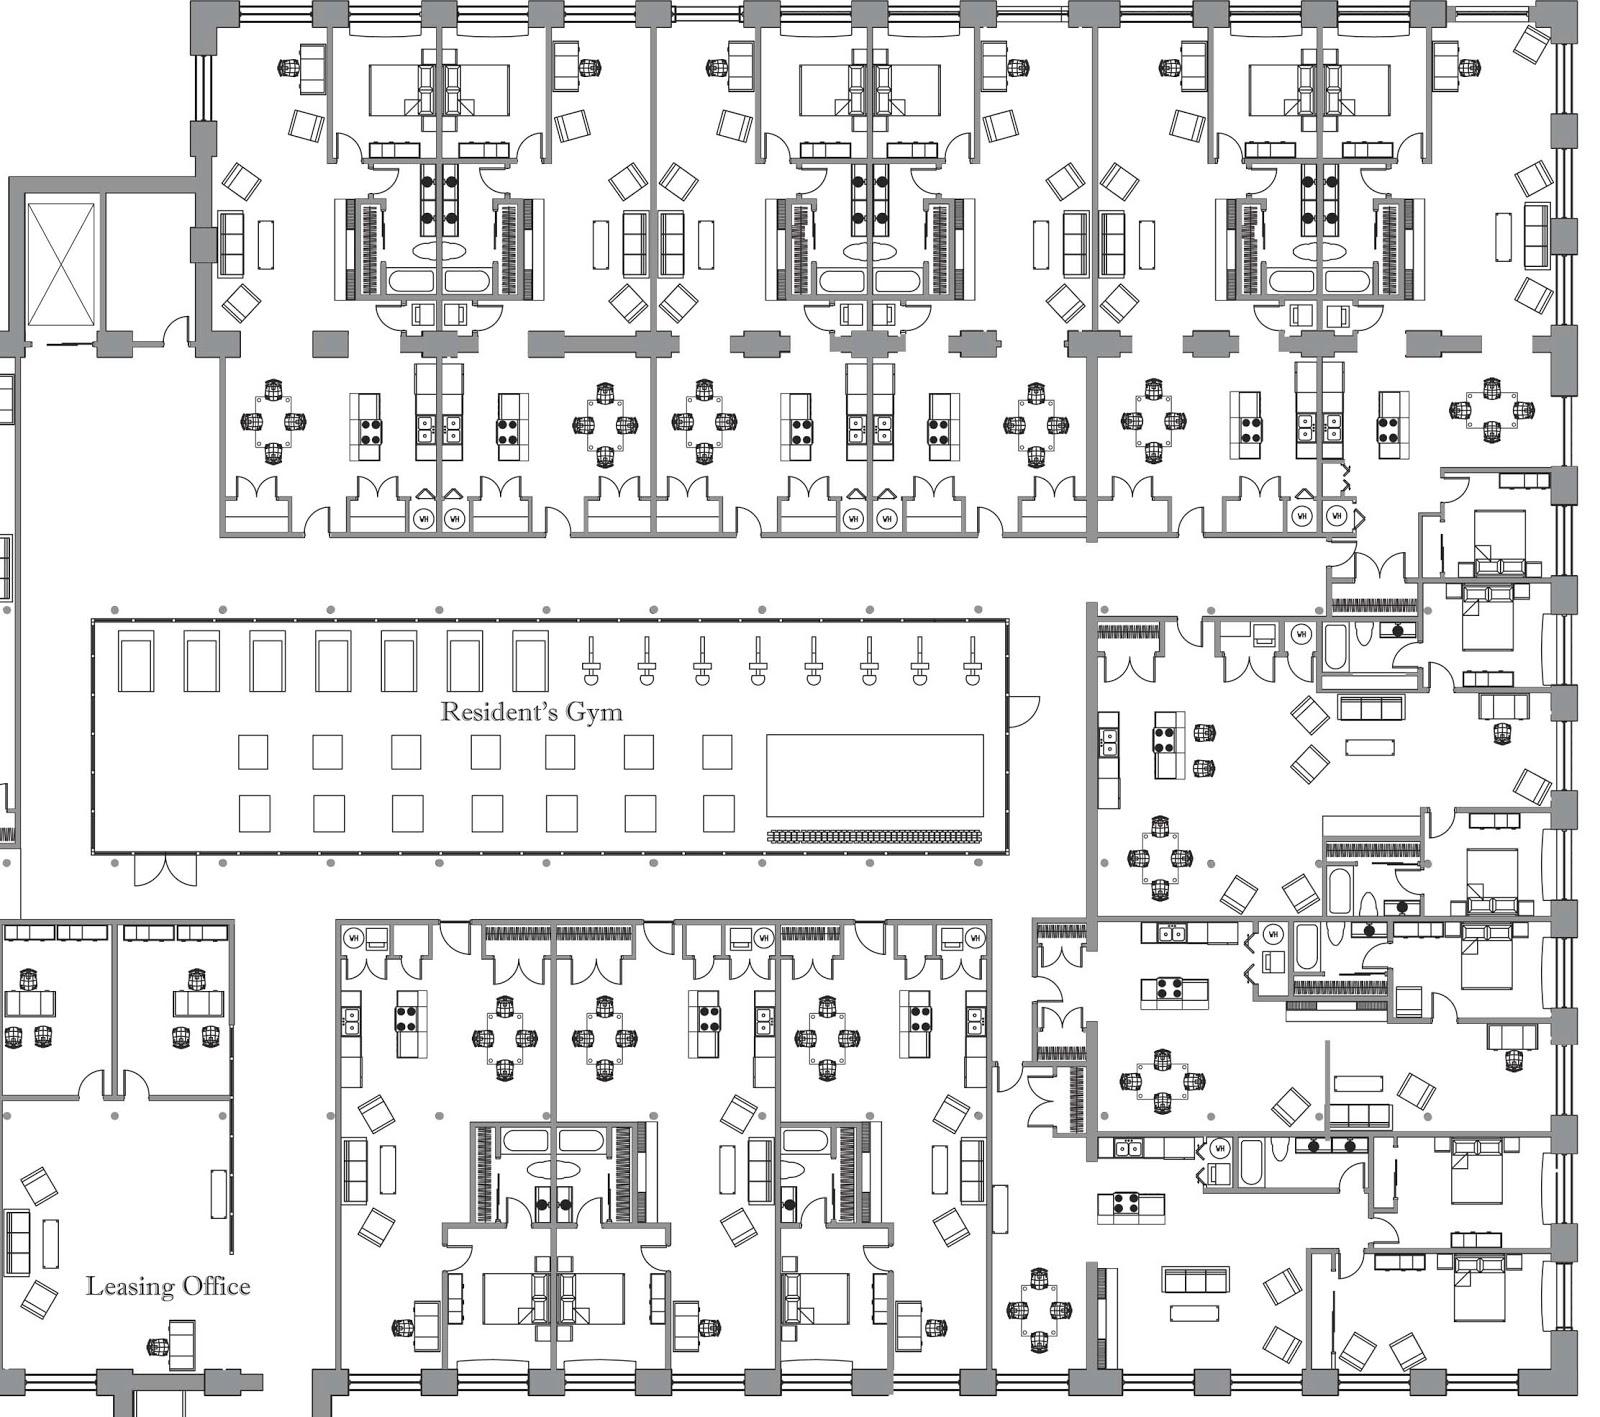 Gym Plans Floor Plan: Designs By Eileen